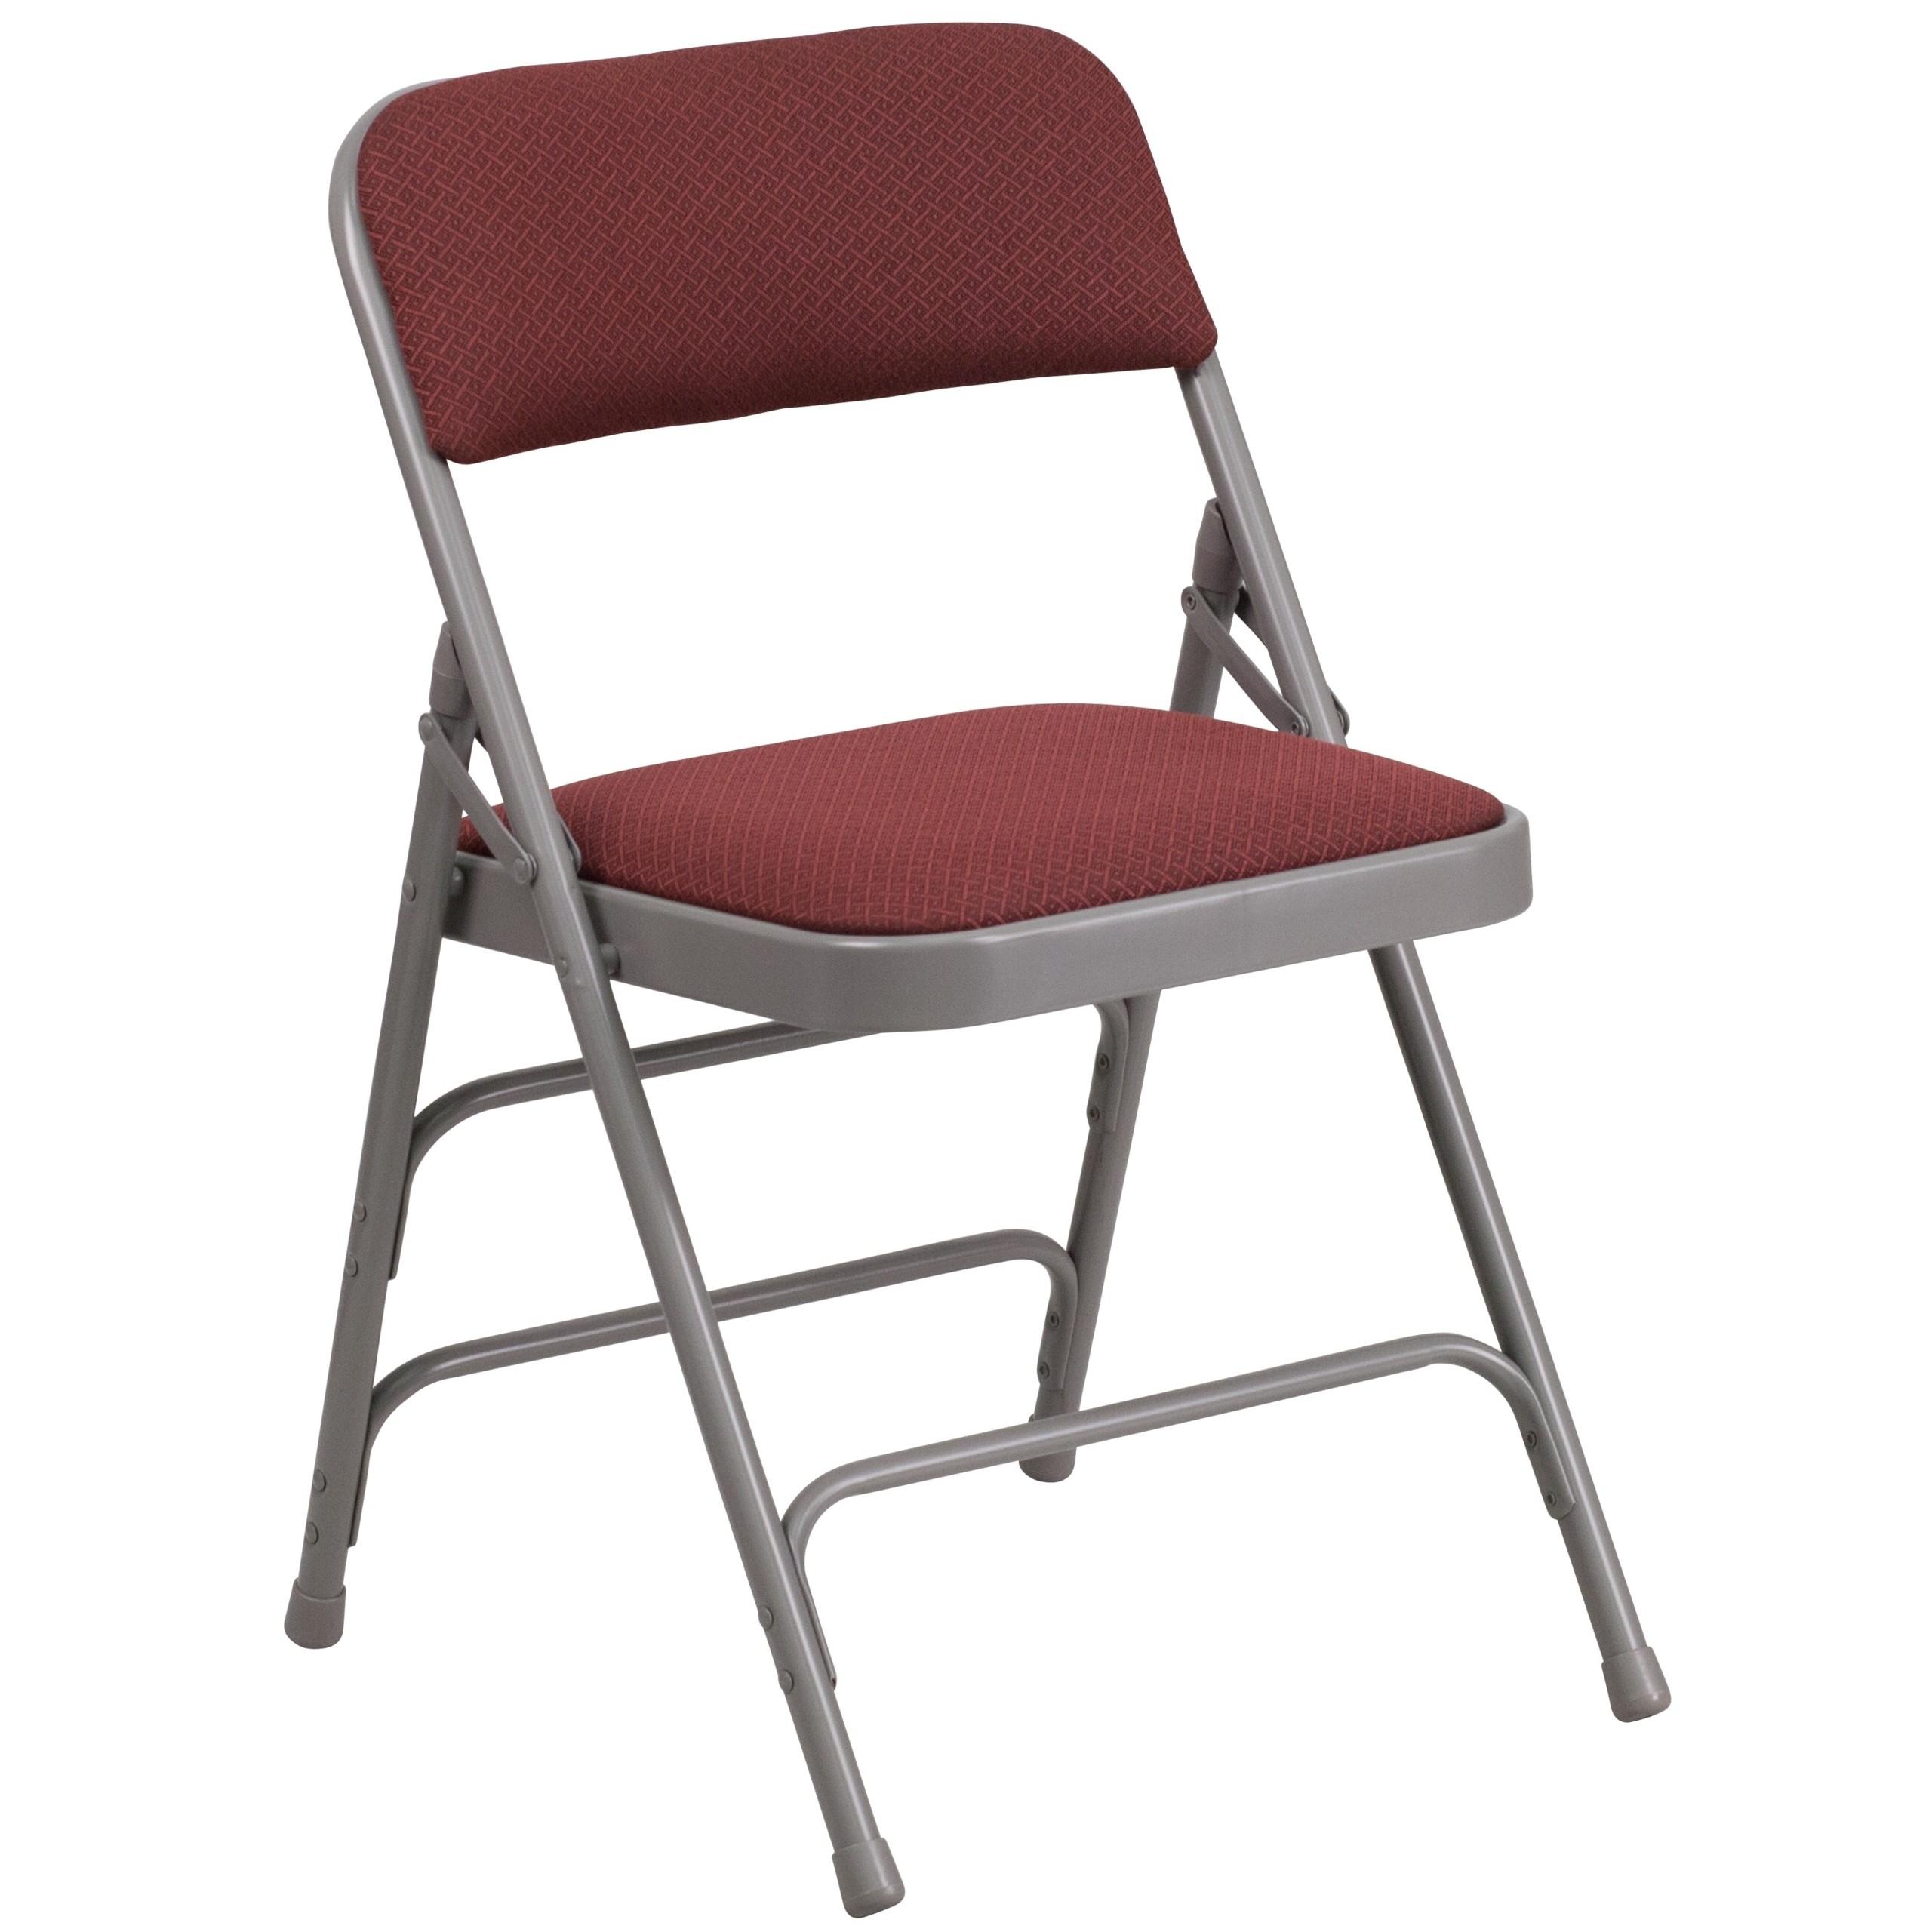 Charmant Hercules Series Folding Chair